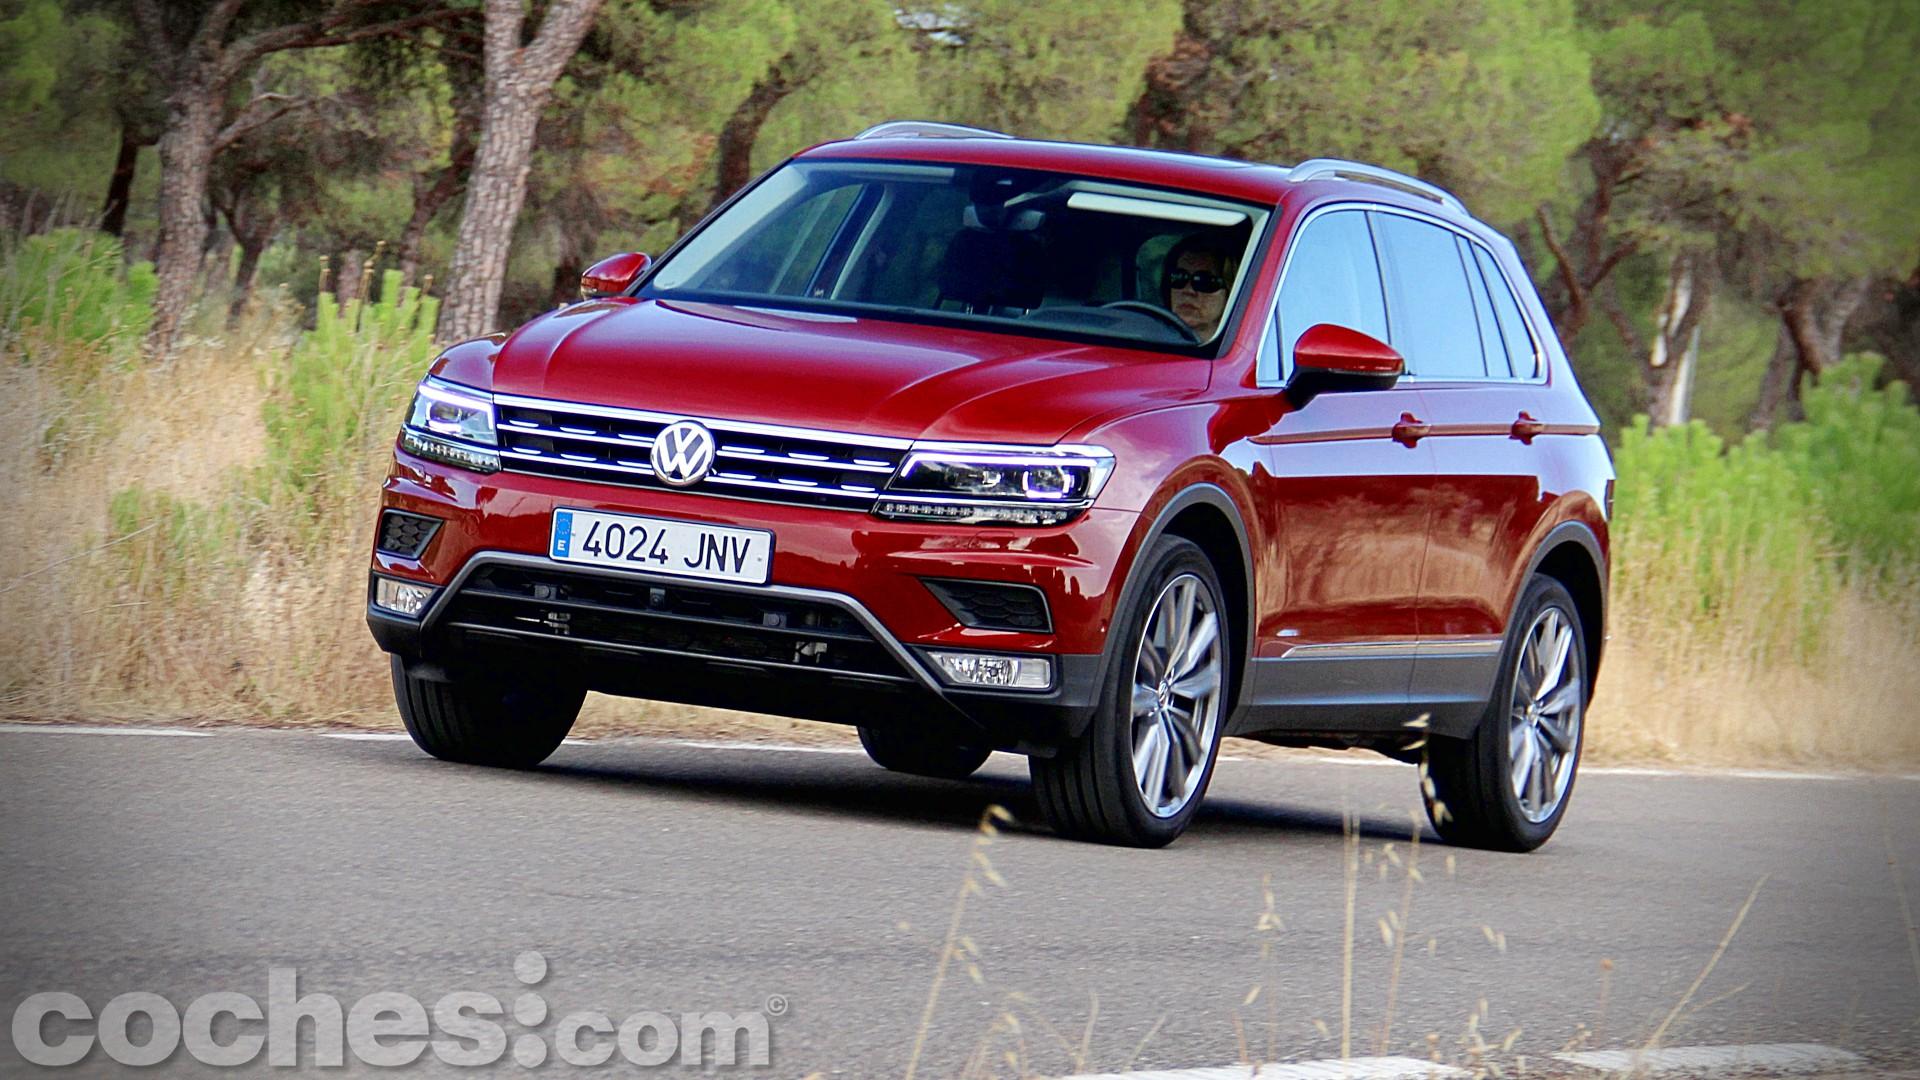 Volkswagen_Tiguan_Sport_2.0TDI_4Motion_087